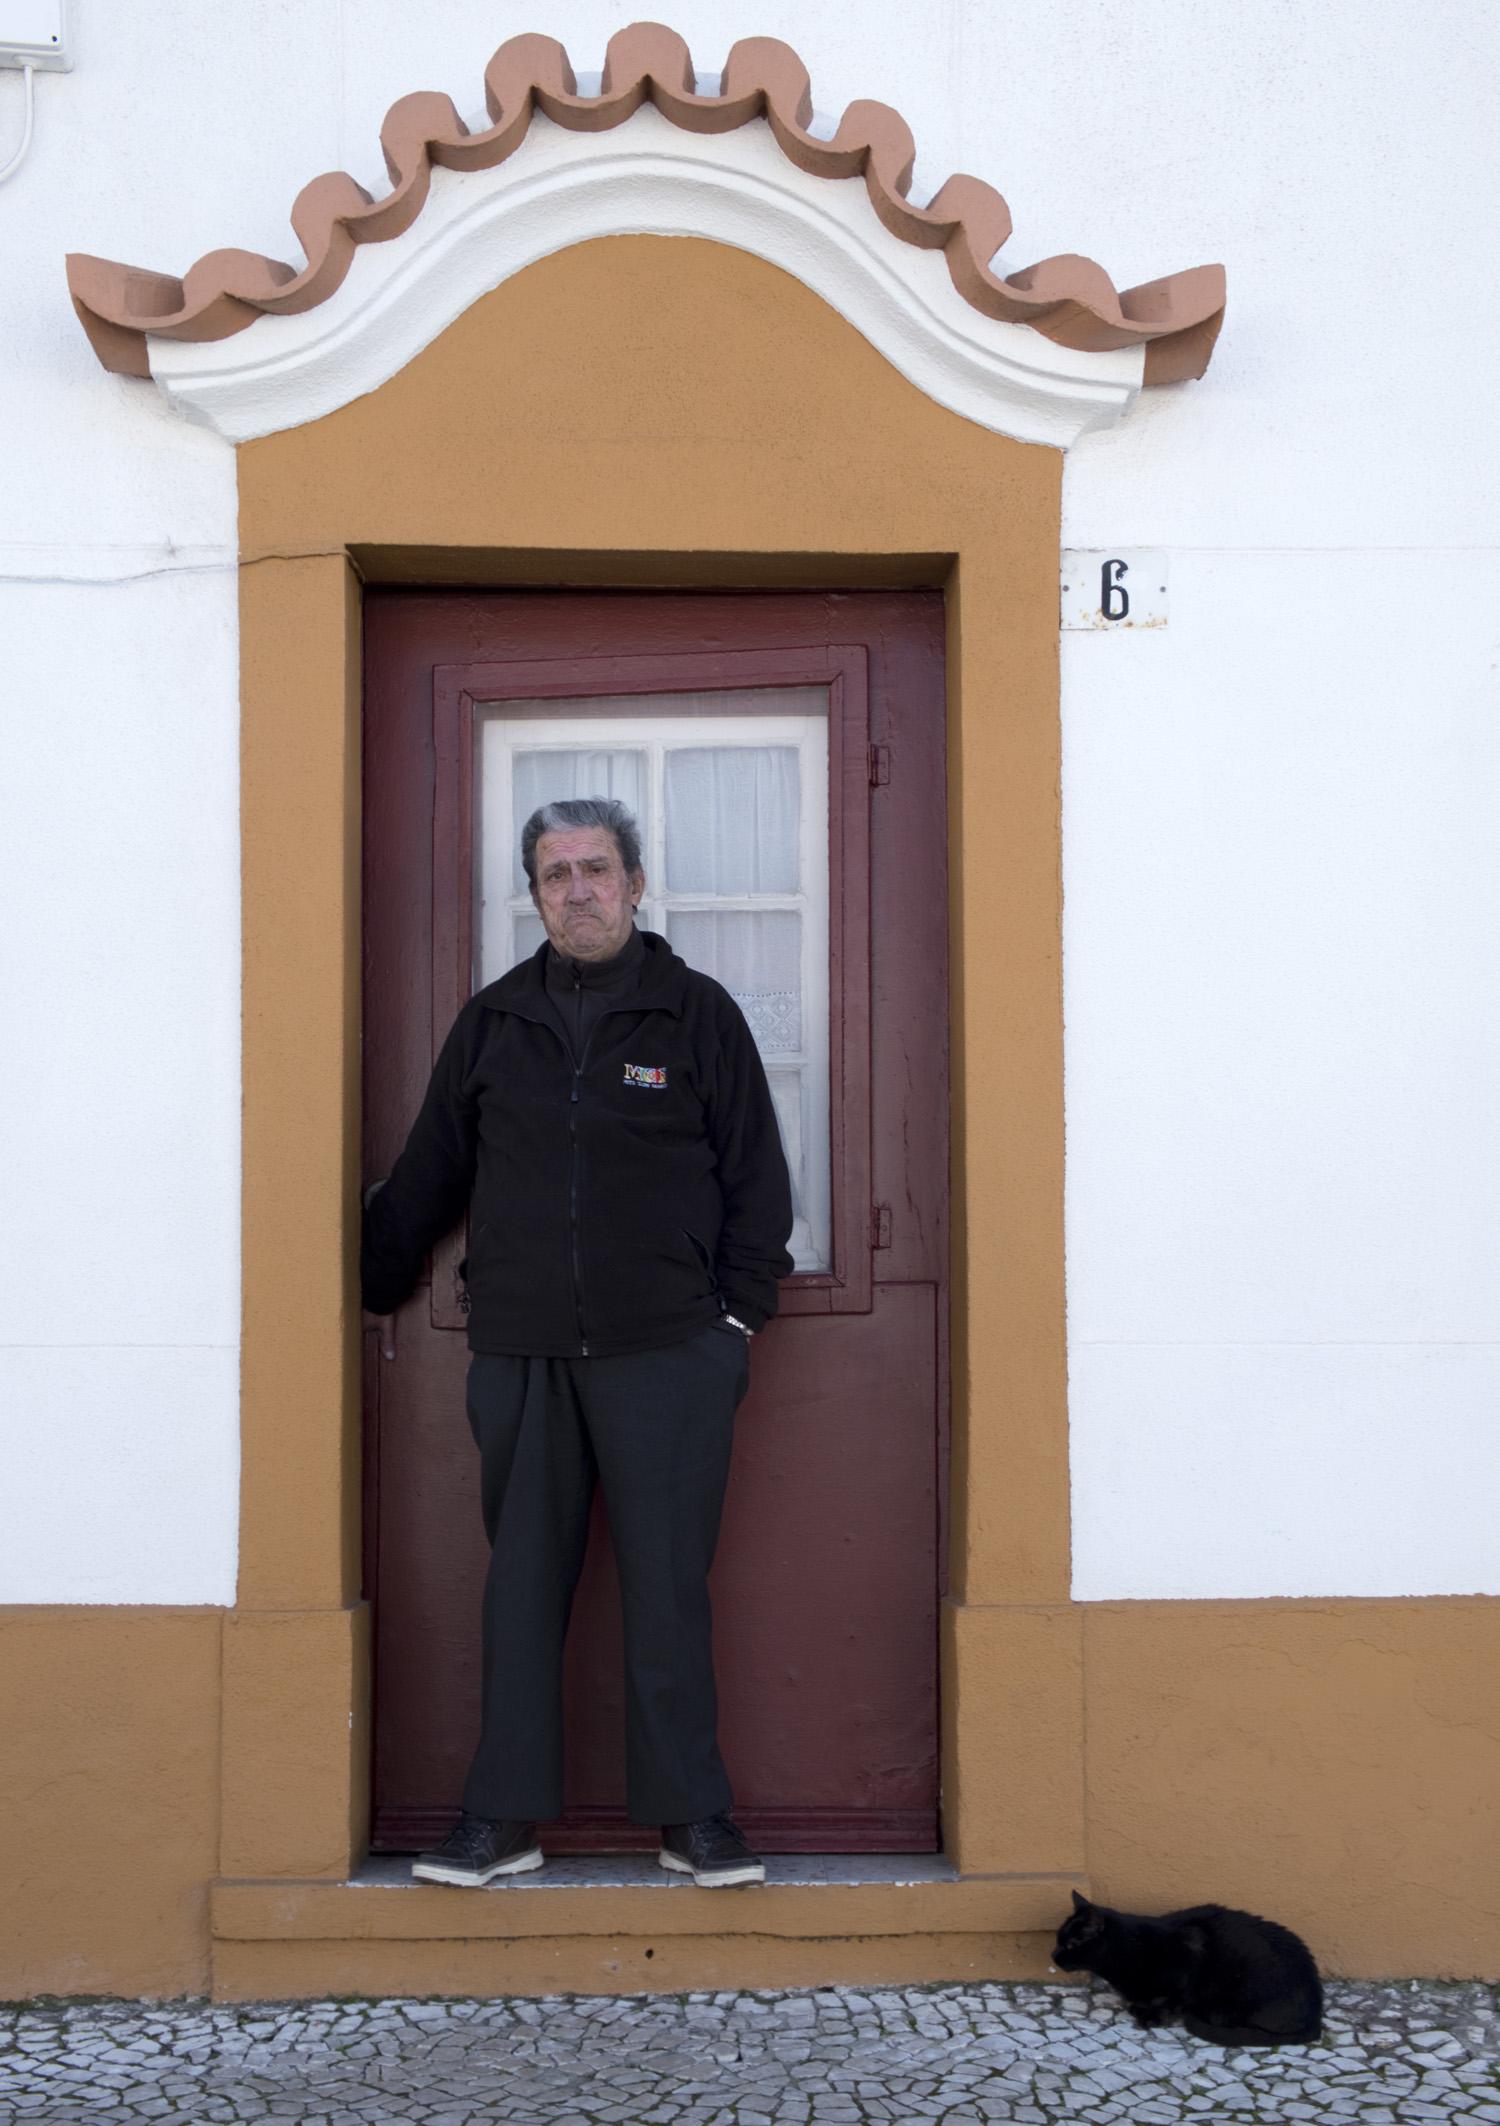 José Parreira